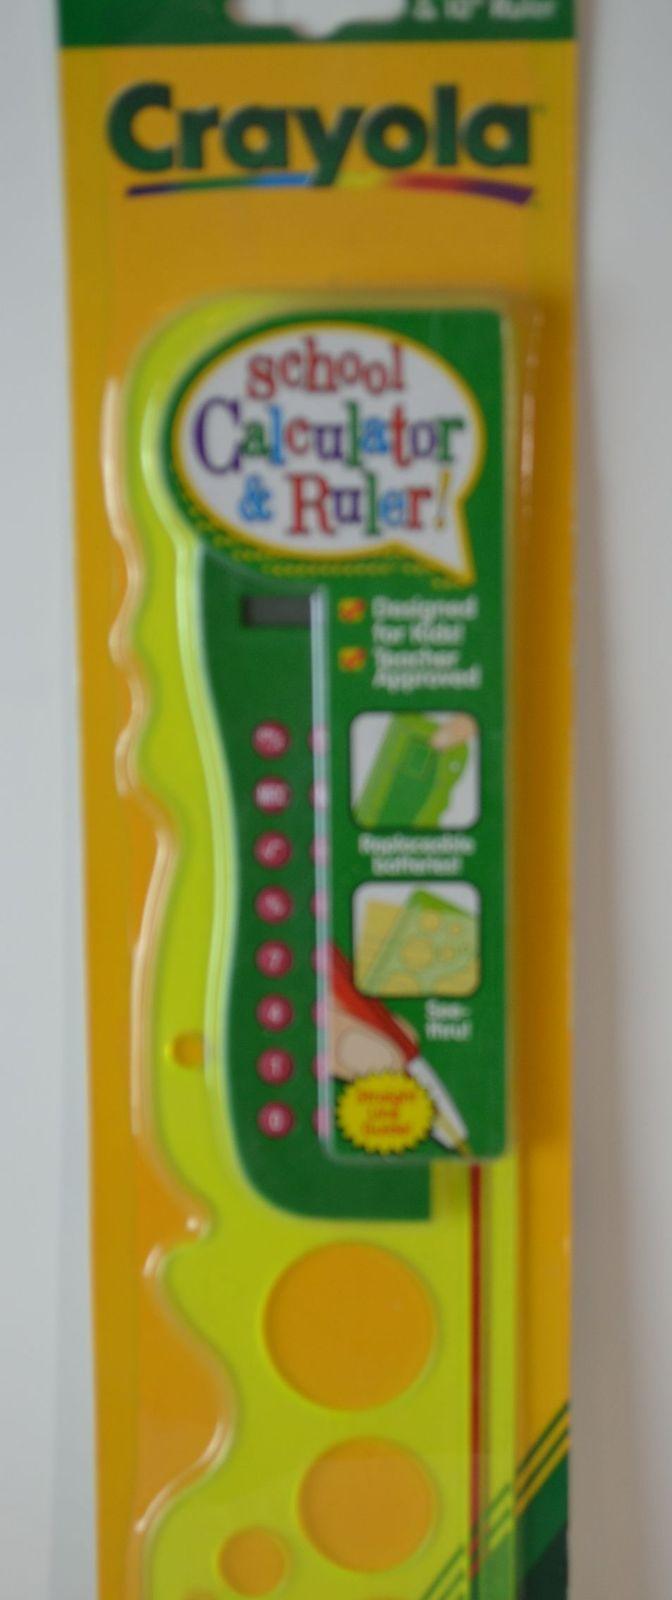 Crayola School Calculator & Ruler